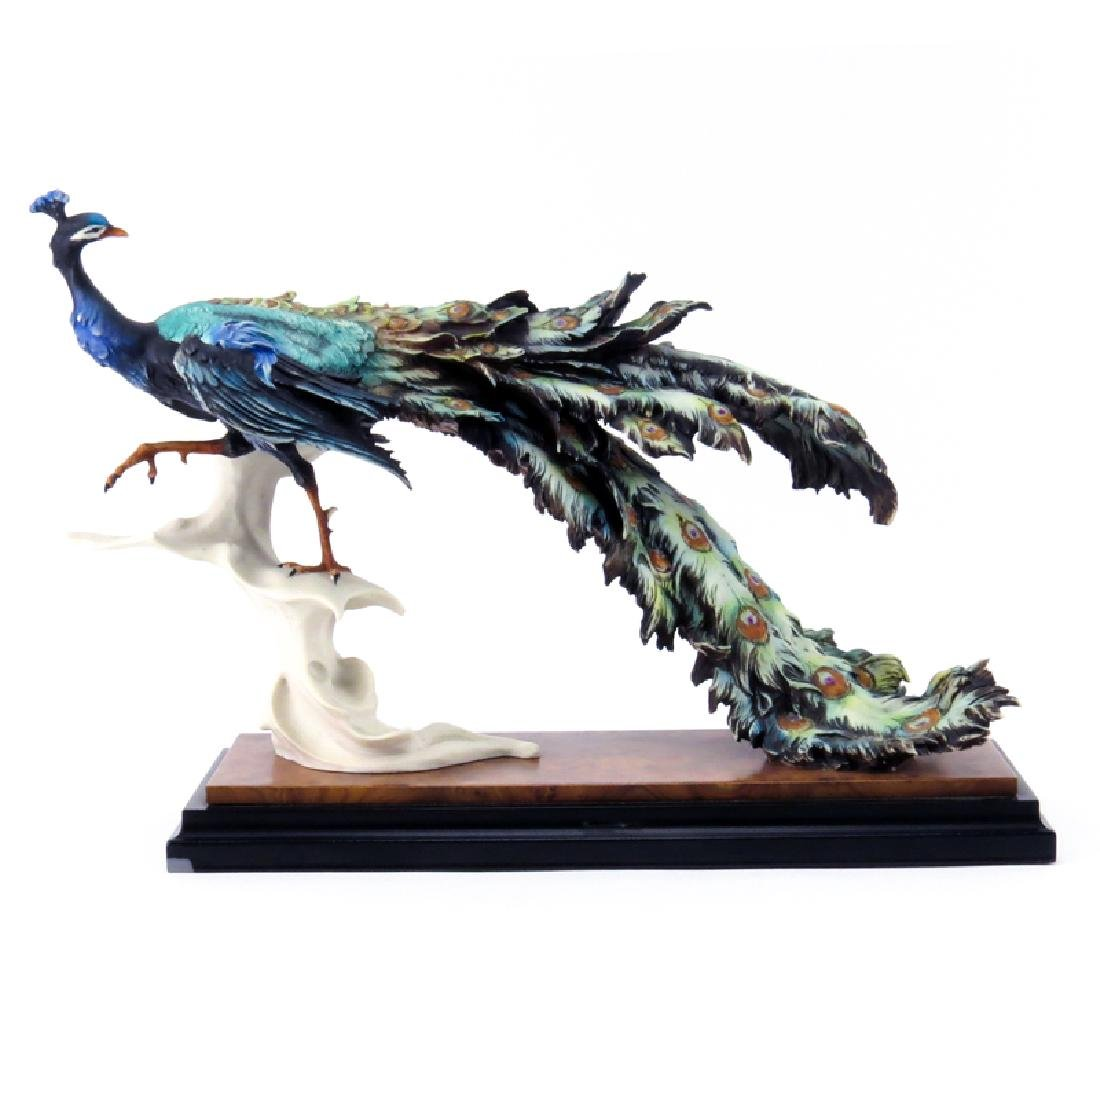 Limited Edition Giuseppe Armani Peacock Figurine